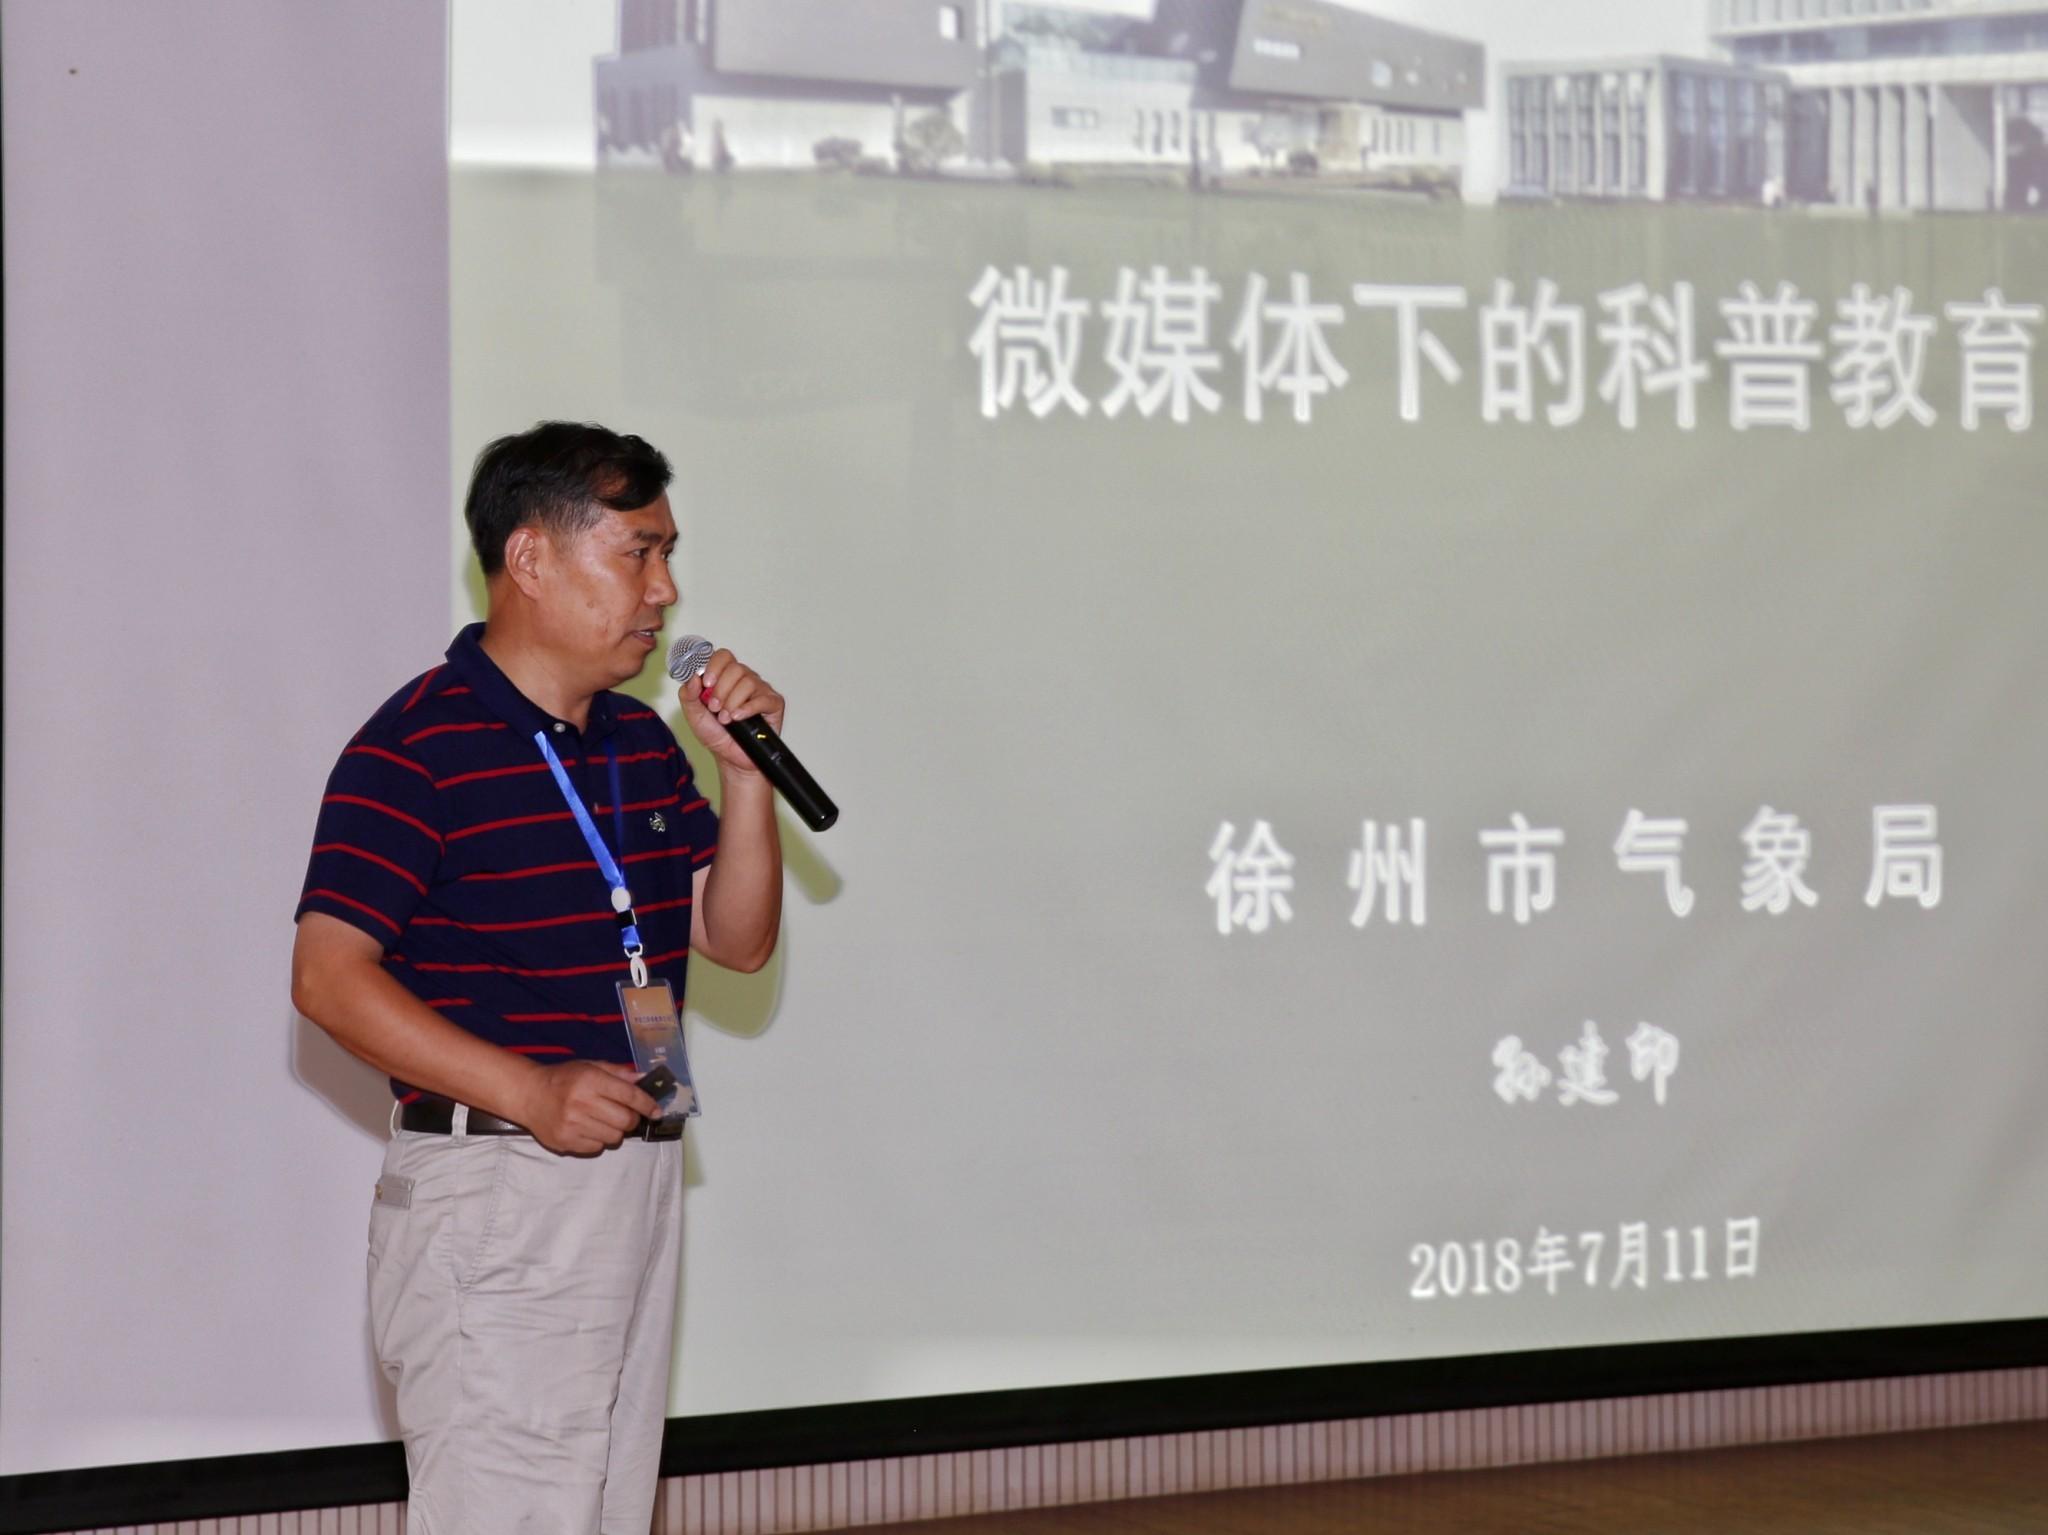 【Pecha kucha】徐州市气象局 孙建印:微媒体下的科普教育